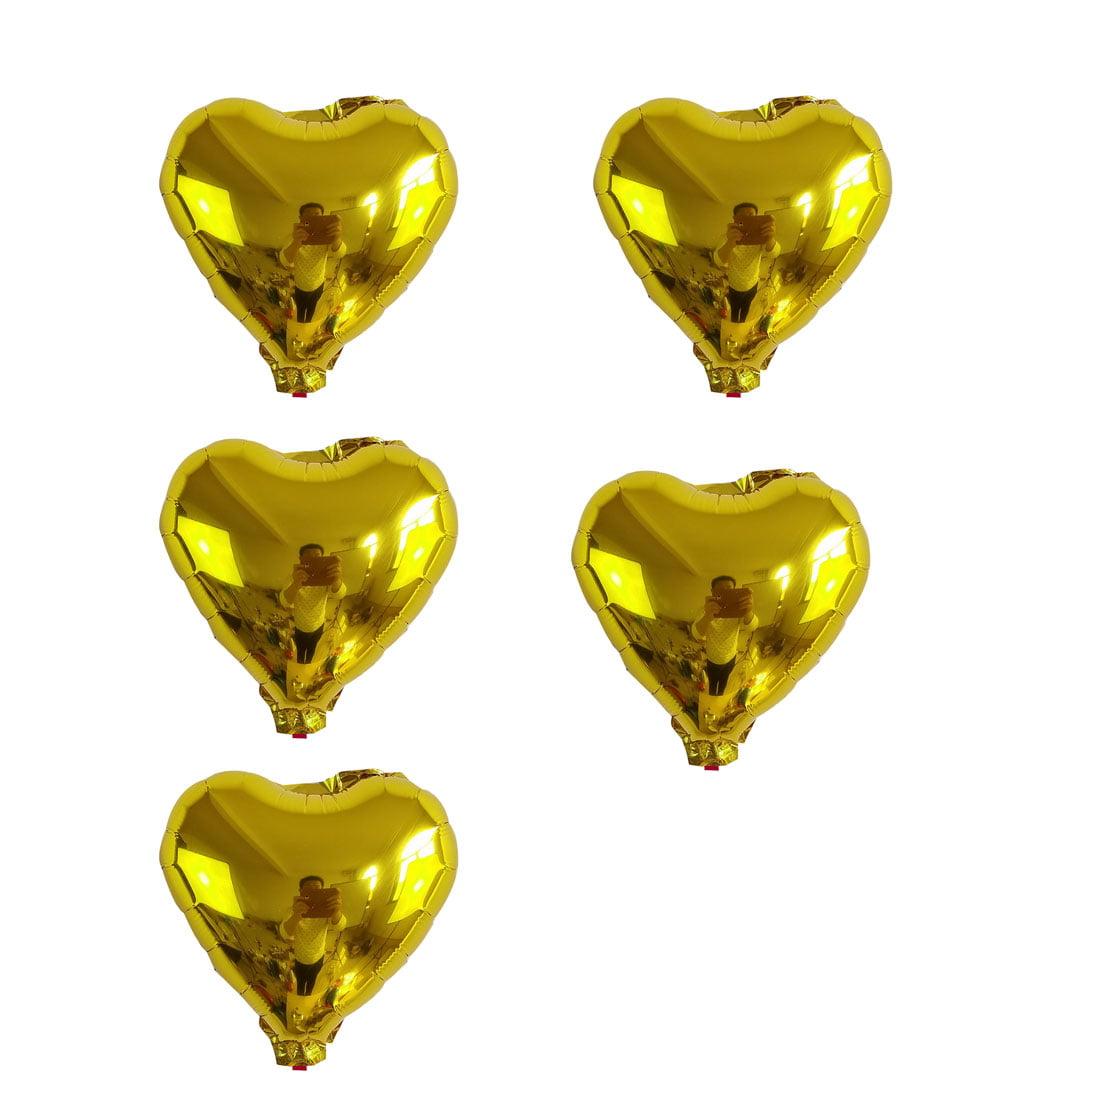 Unique Bargains Foil Heart Shape Balloon Birthday Wedding Decor Gold Tone 5 Inches 5 Pcs